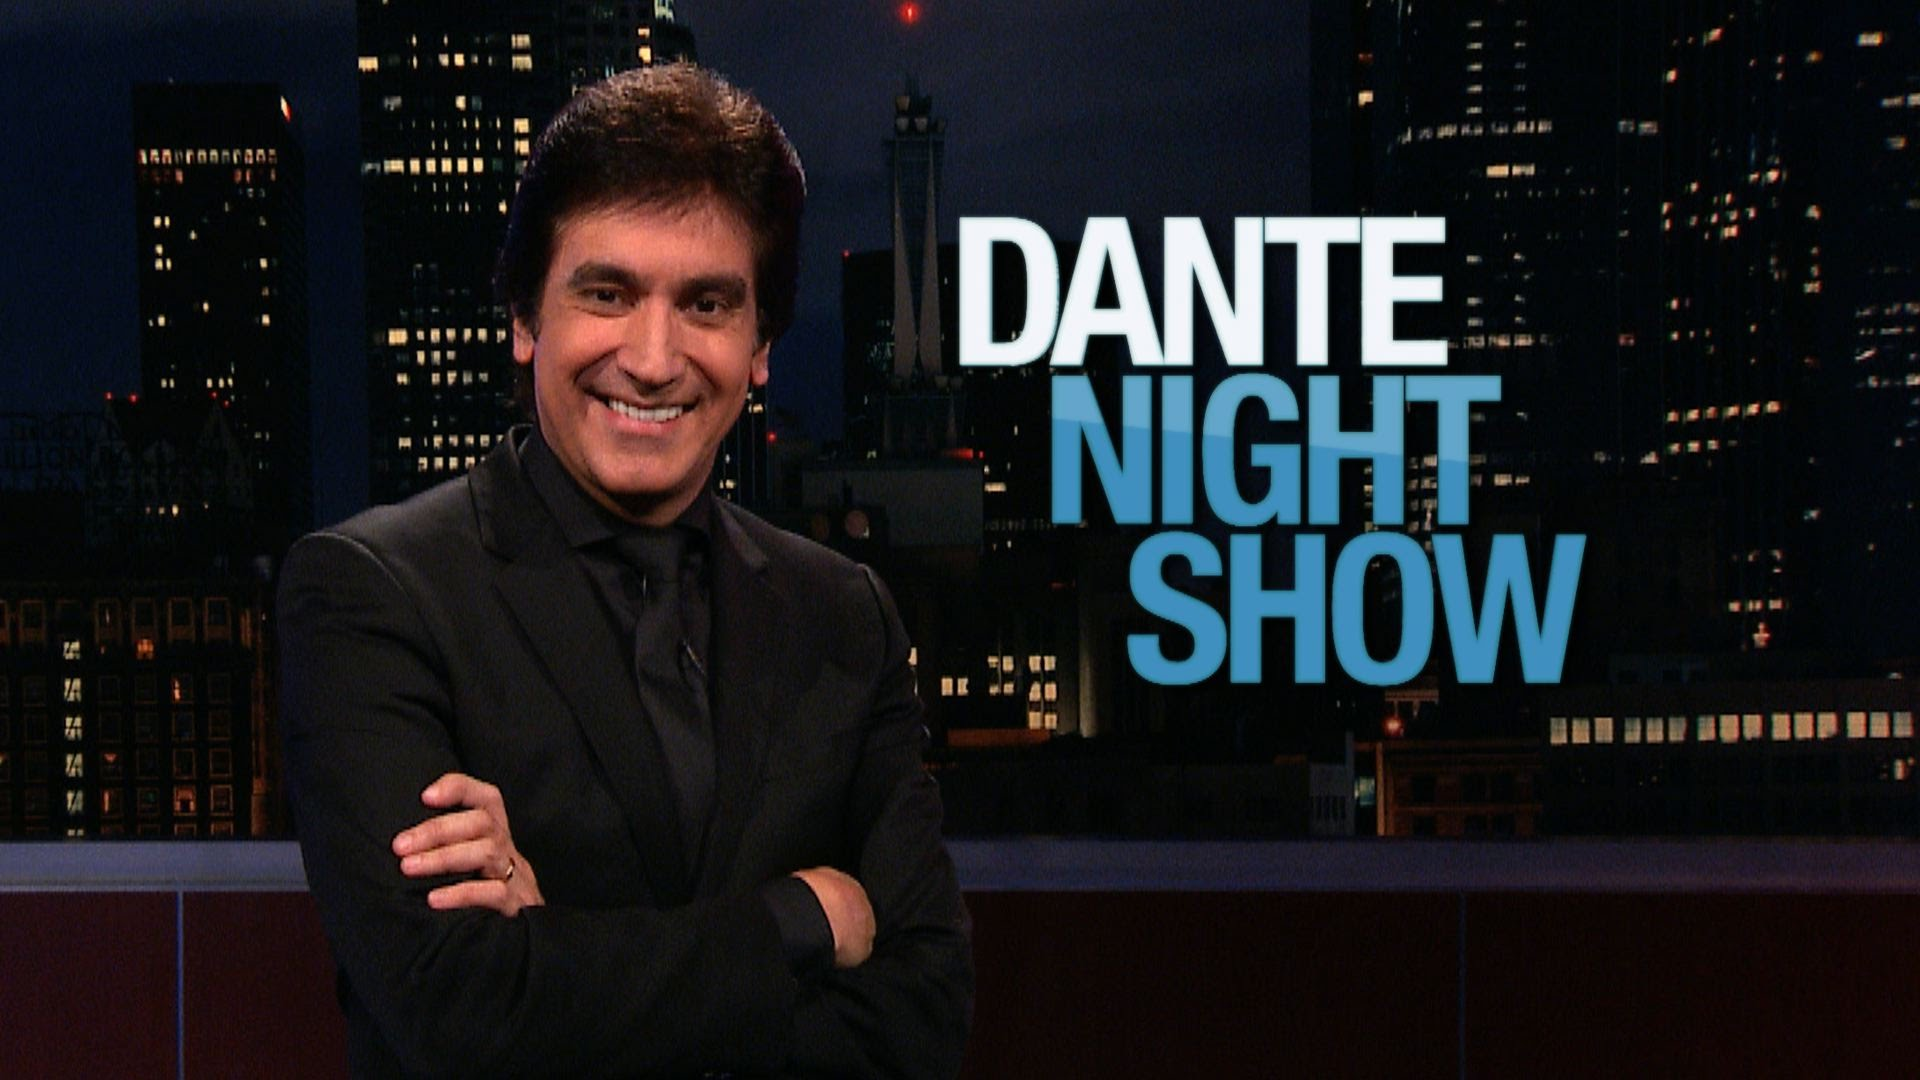 Courtesy of Dante Night Show